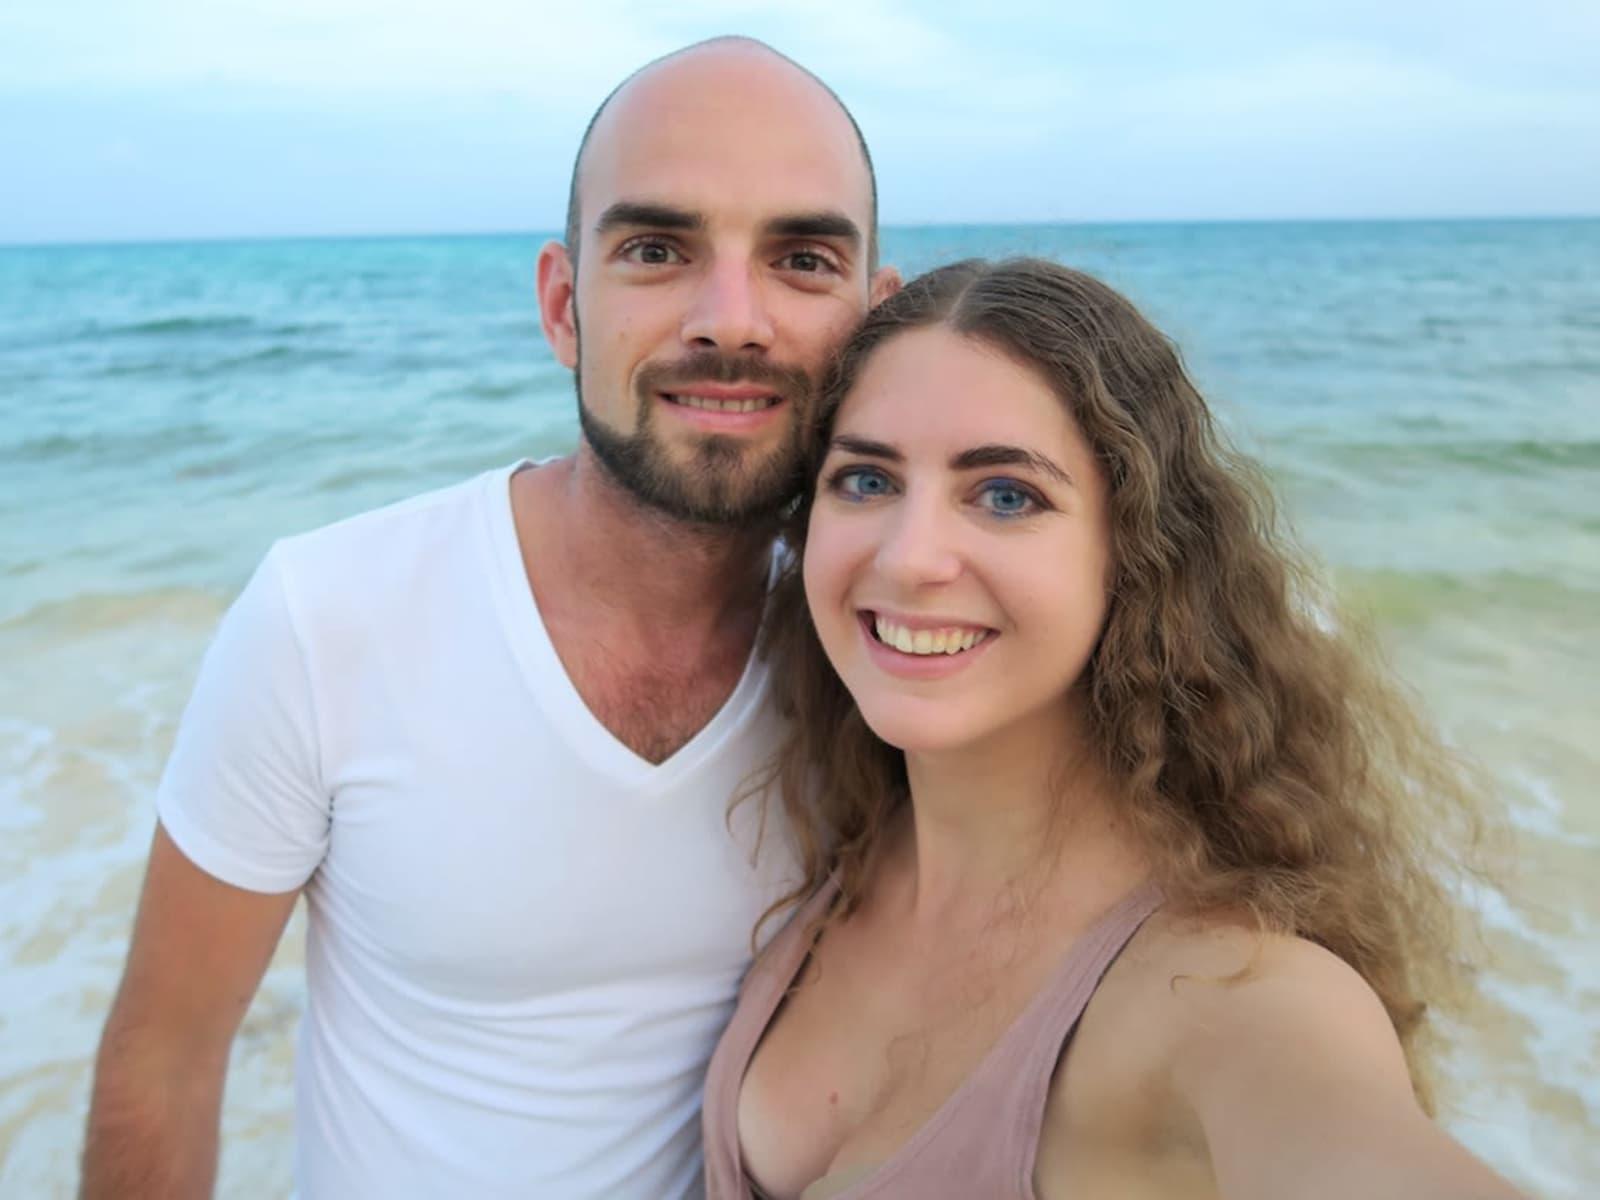 Jordan & Liviu from Miami, Florida, United States